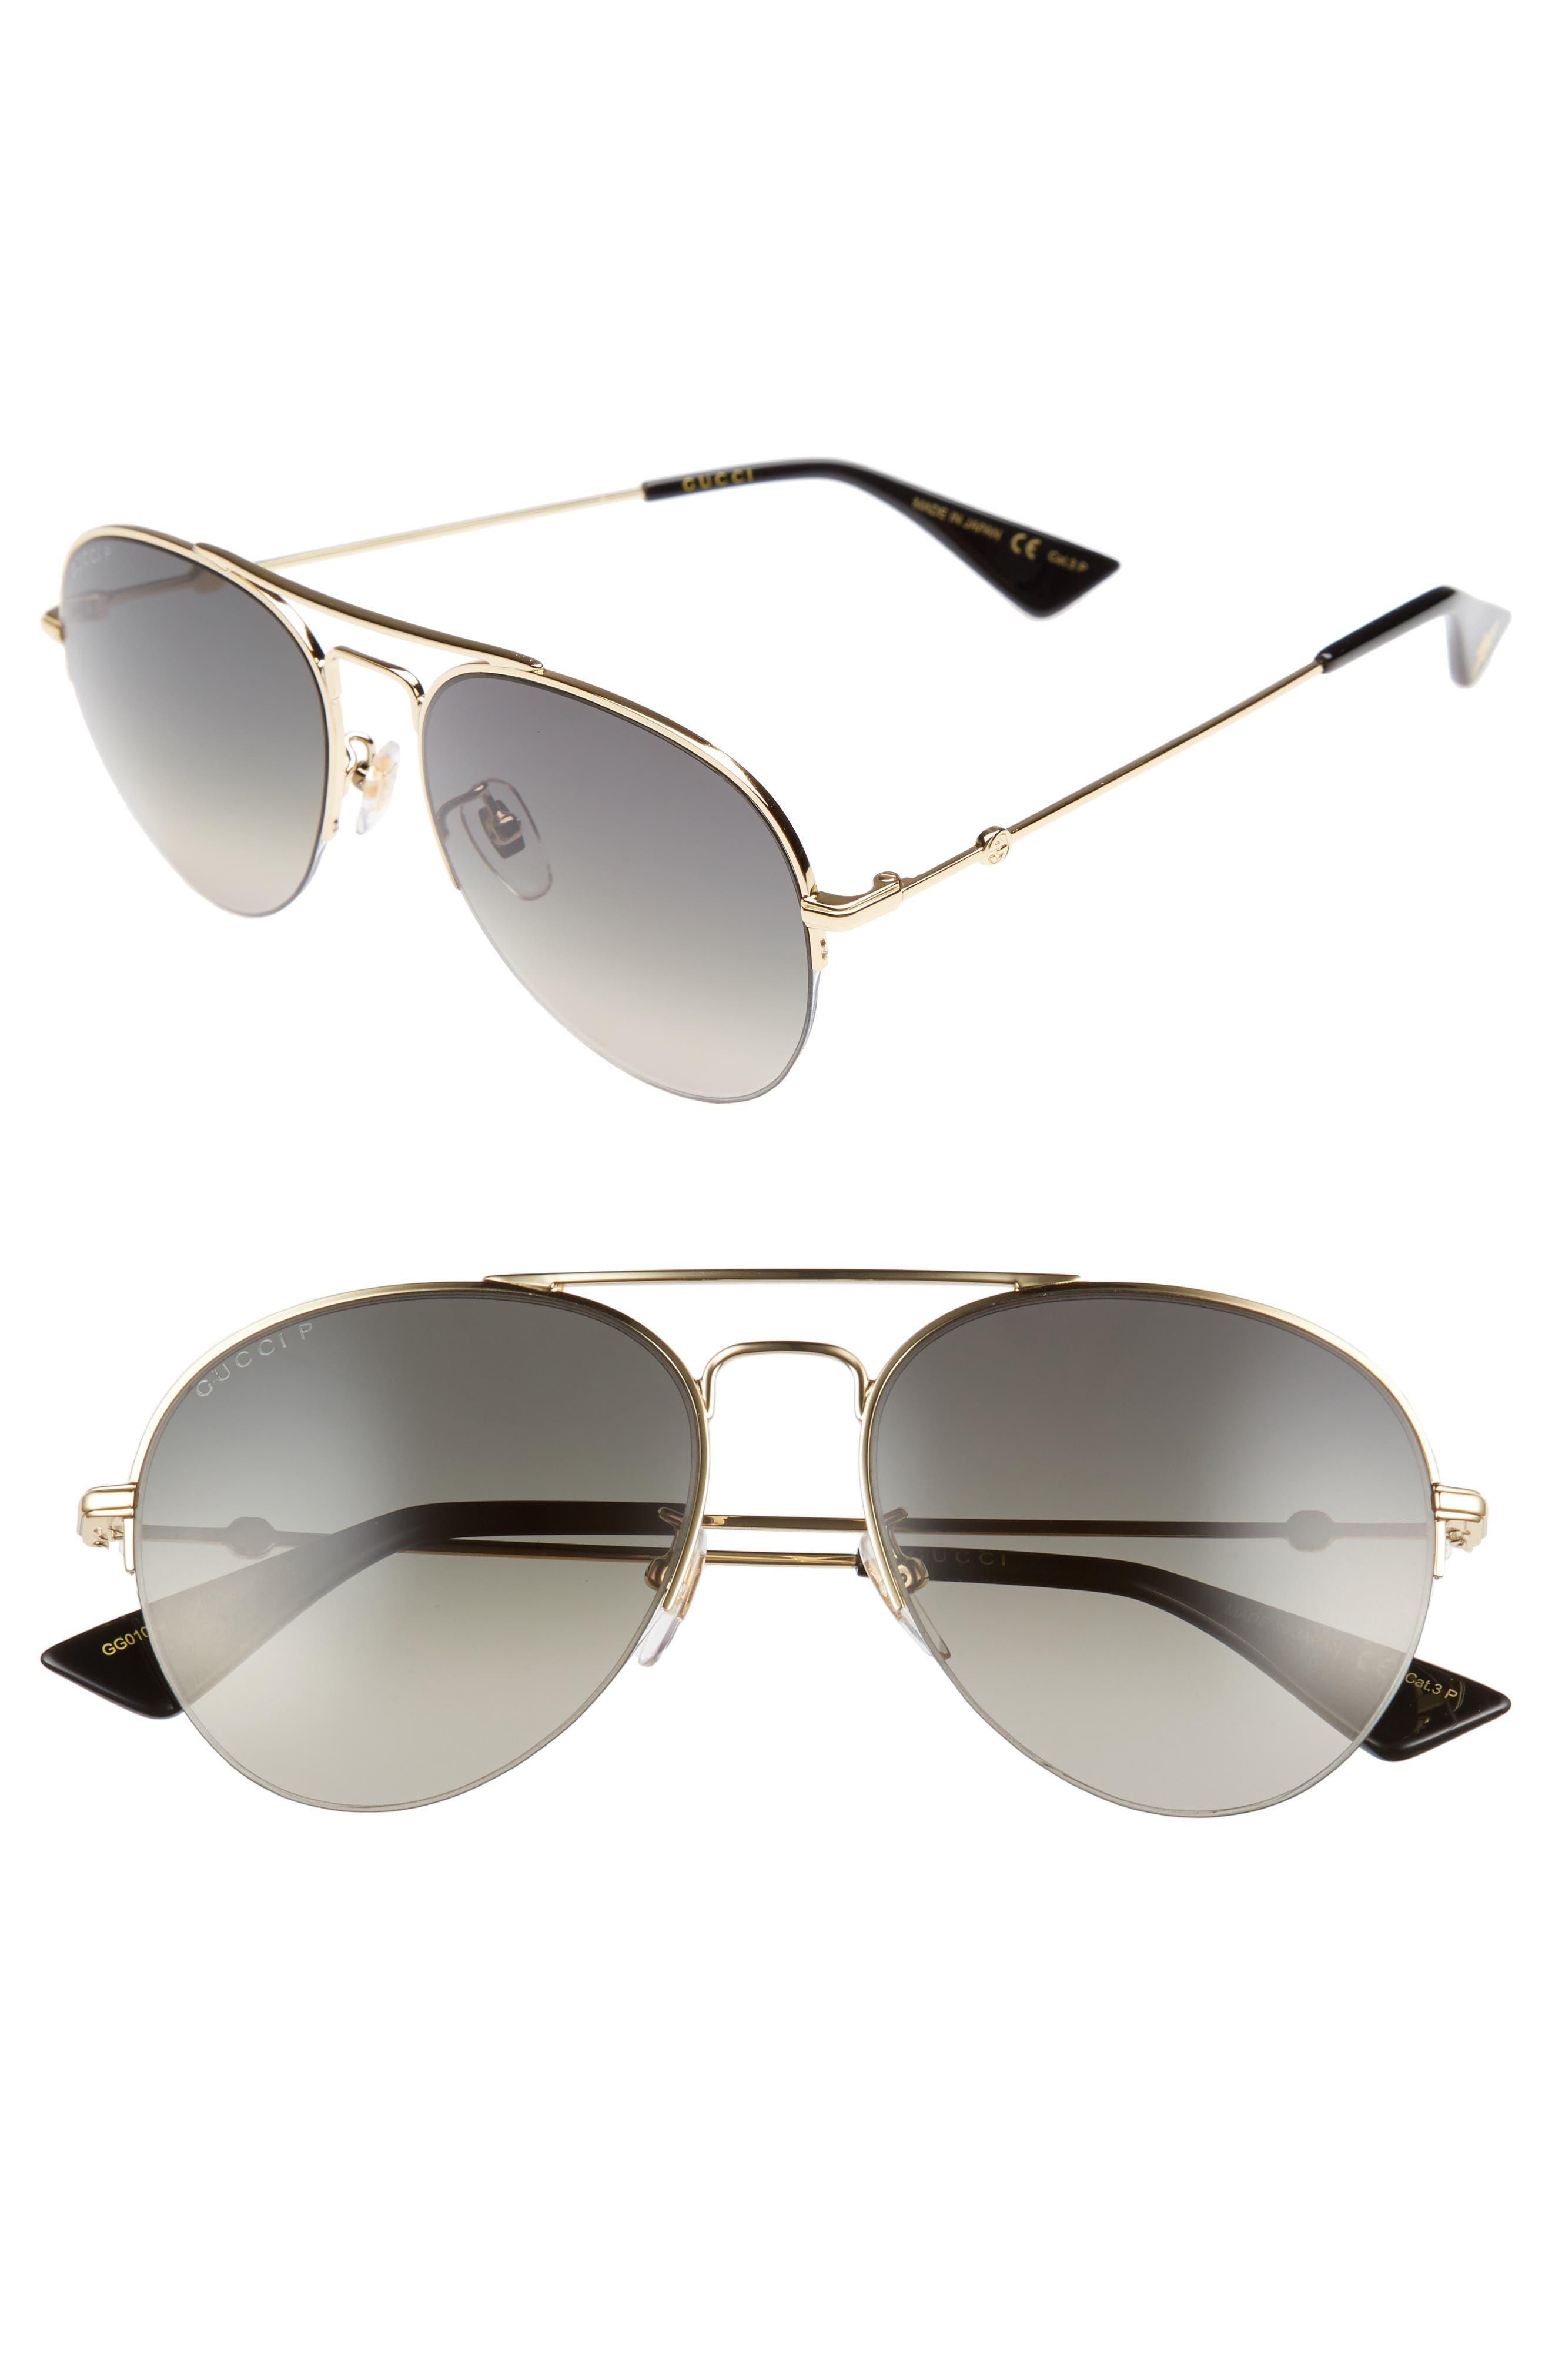 Main Image - Gucci Pilot 56mm Aviator Sunglasses